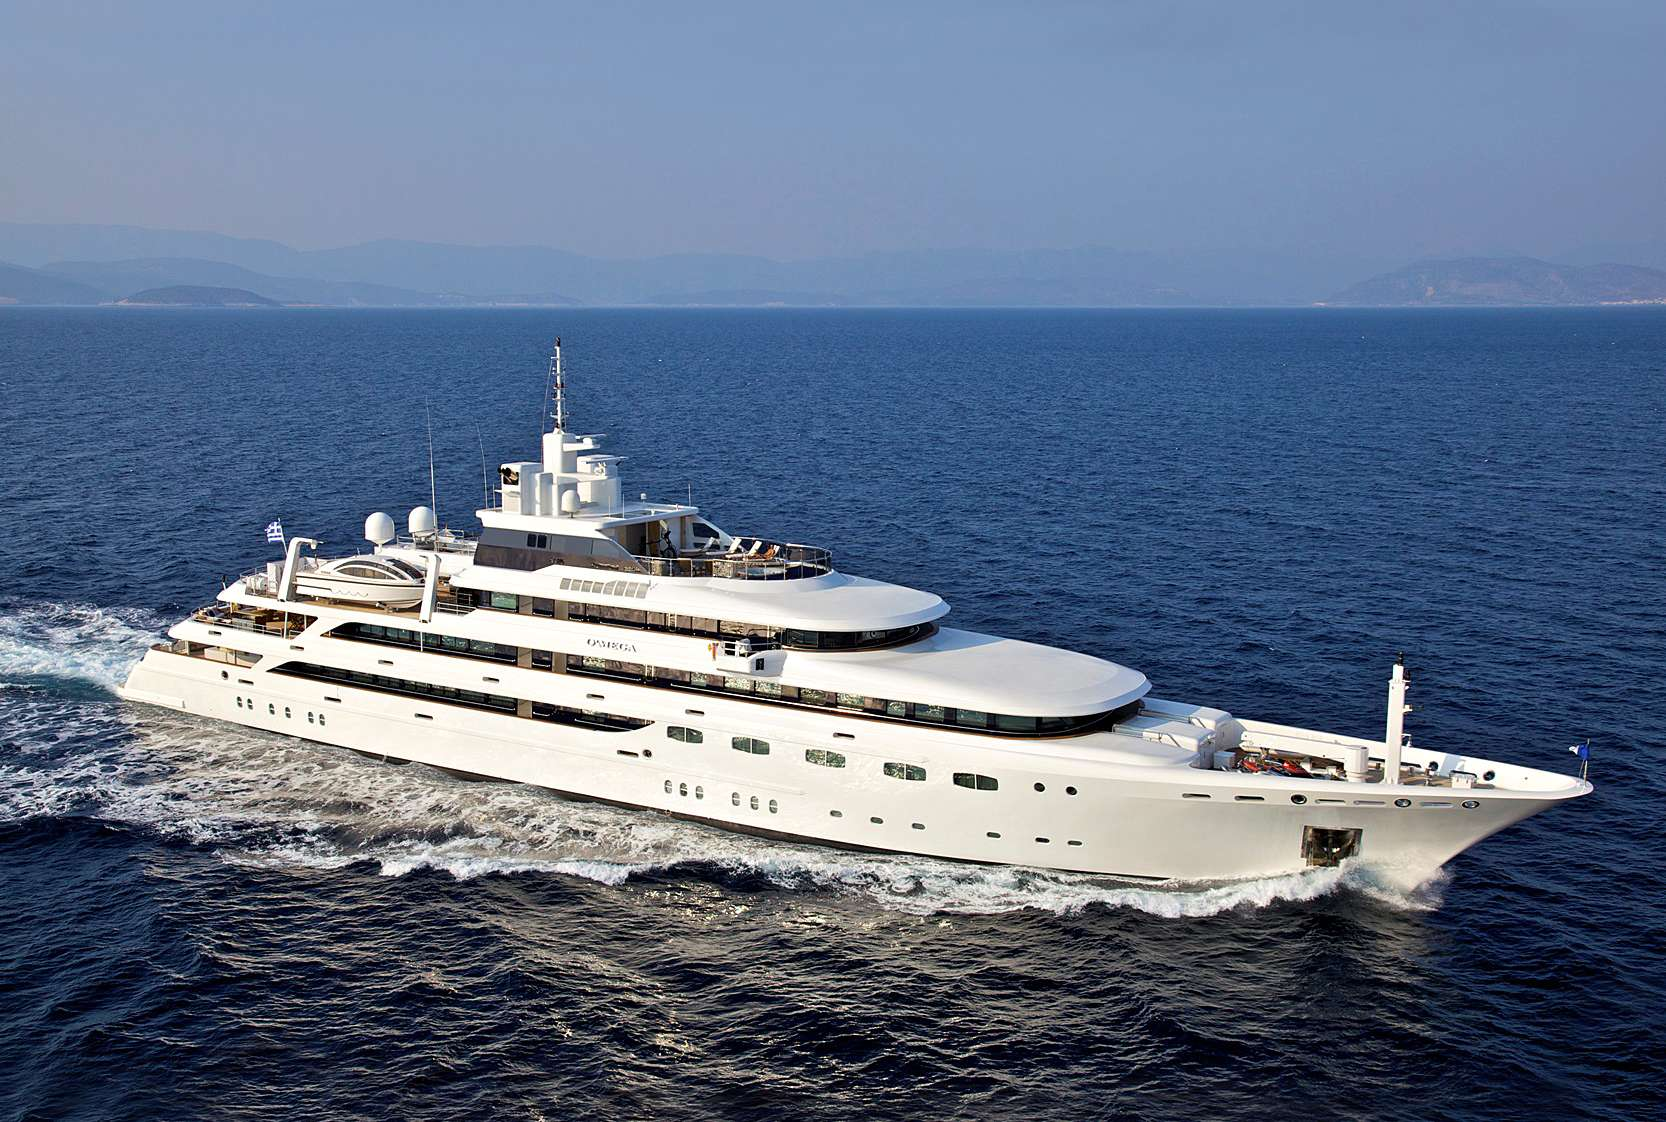 Power Yacht 'Power', 30 PAX, 28 Crew, 270.00 Ft, 82.00 Meters, Built 2004, Mitsubishi, Refit Year 2015